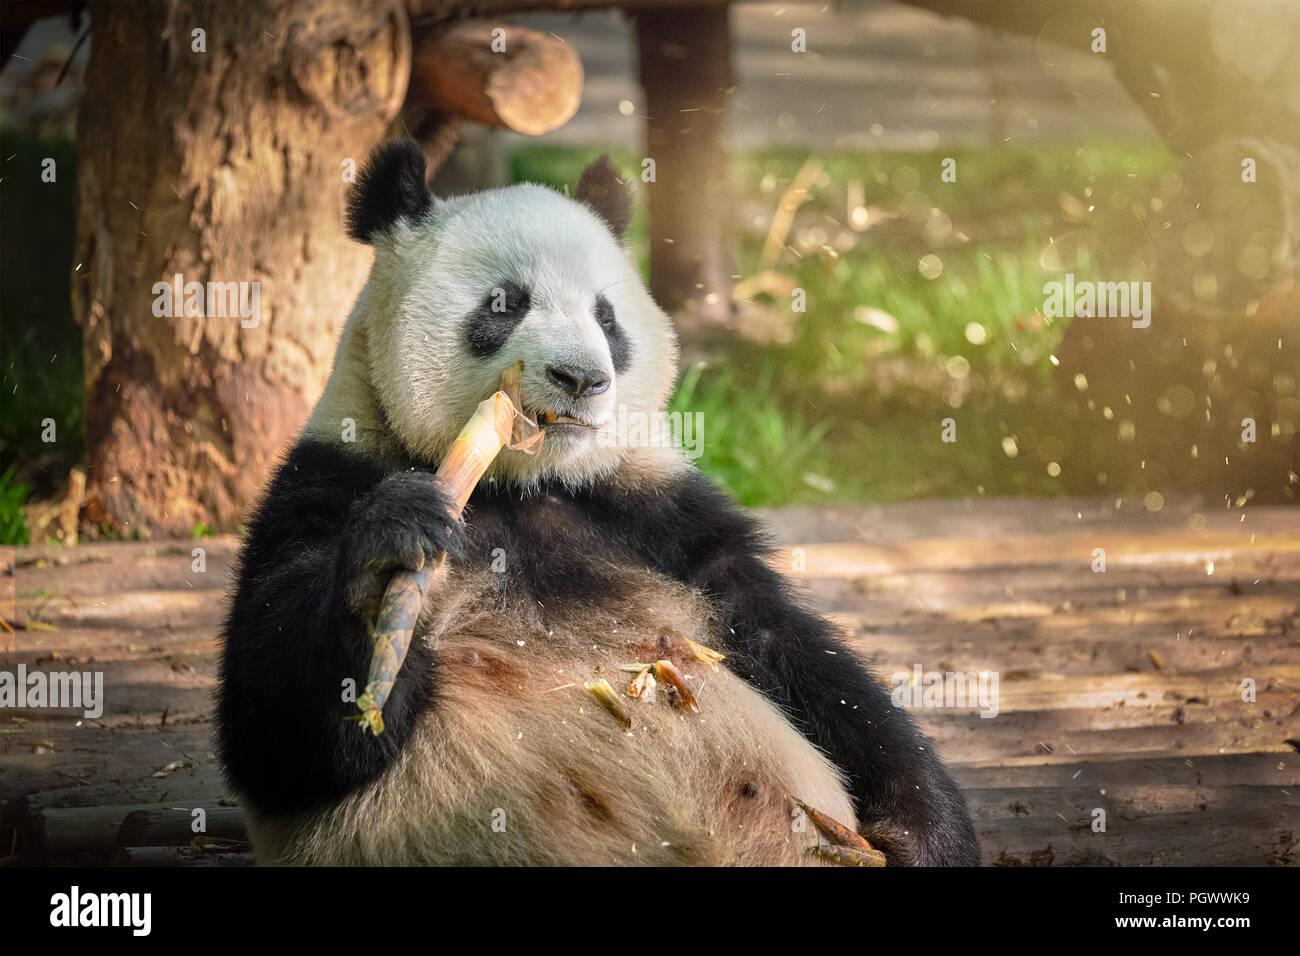 Oso Panda gigante en China Imagen De Stock